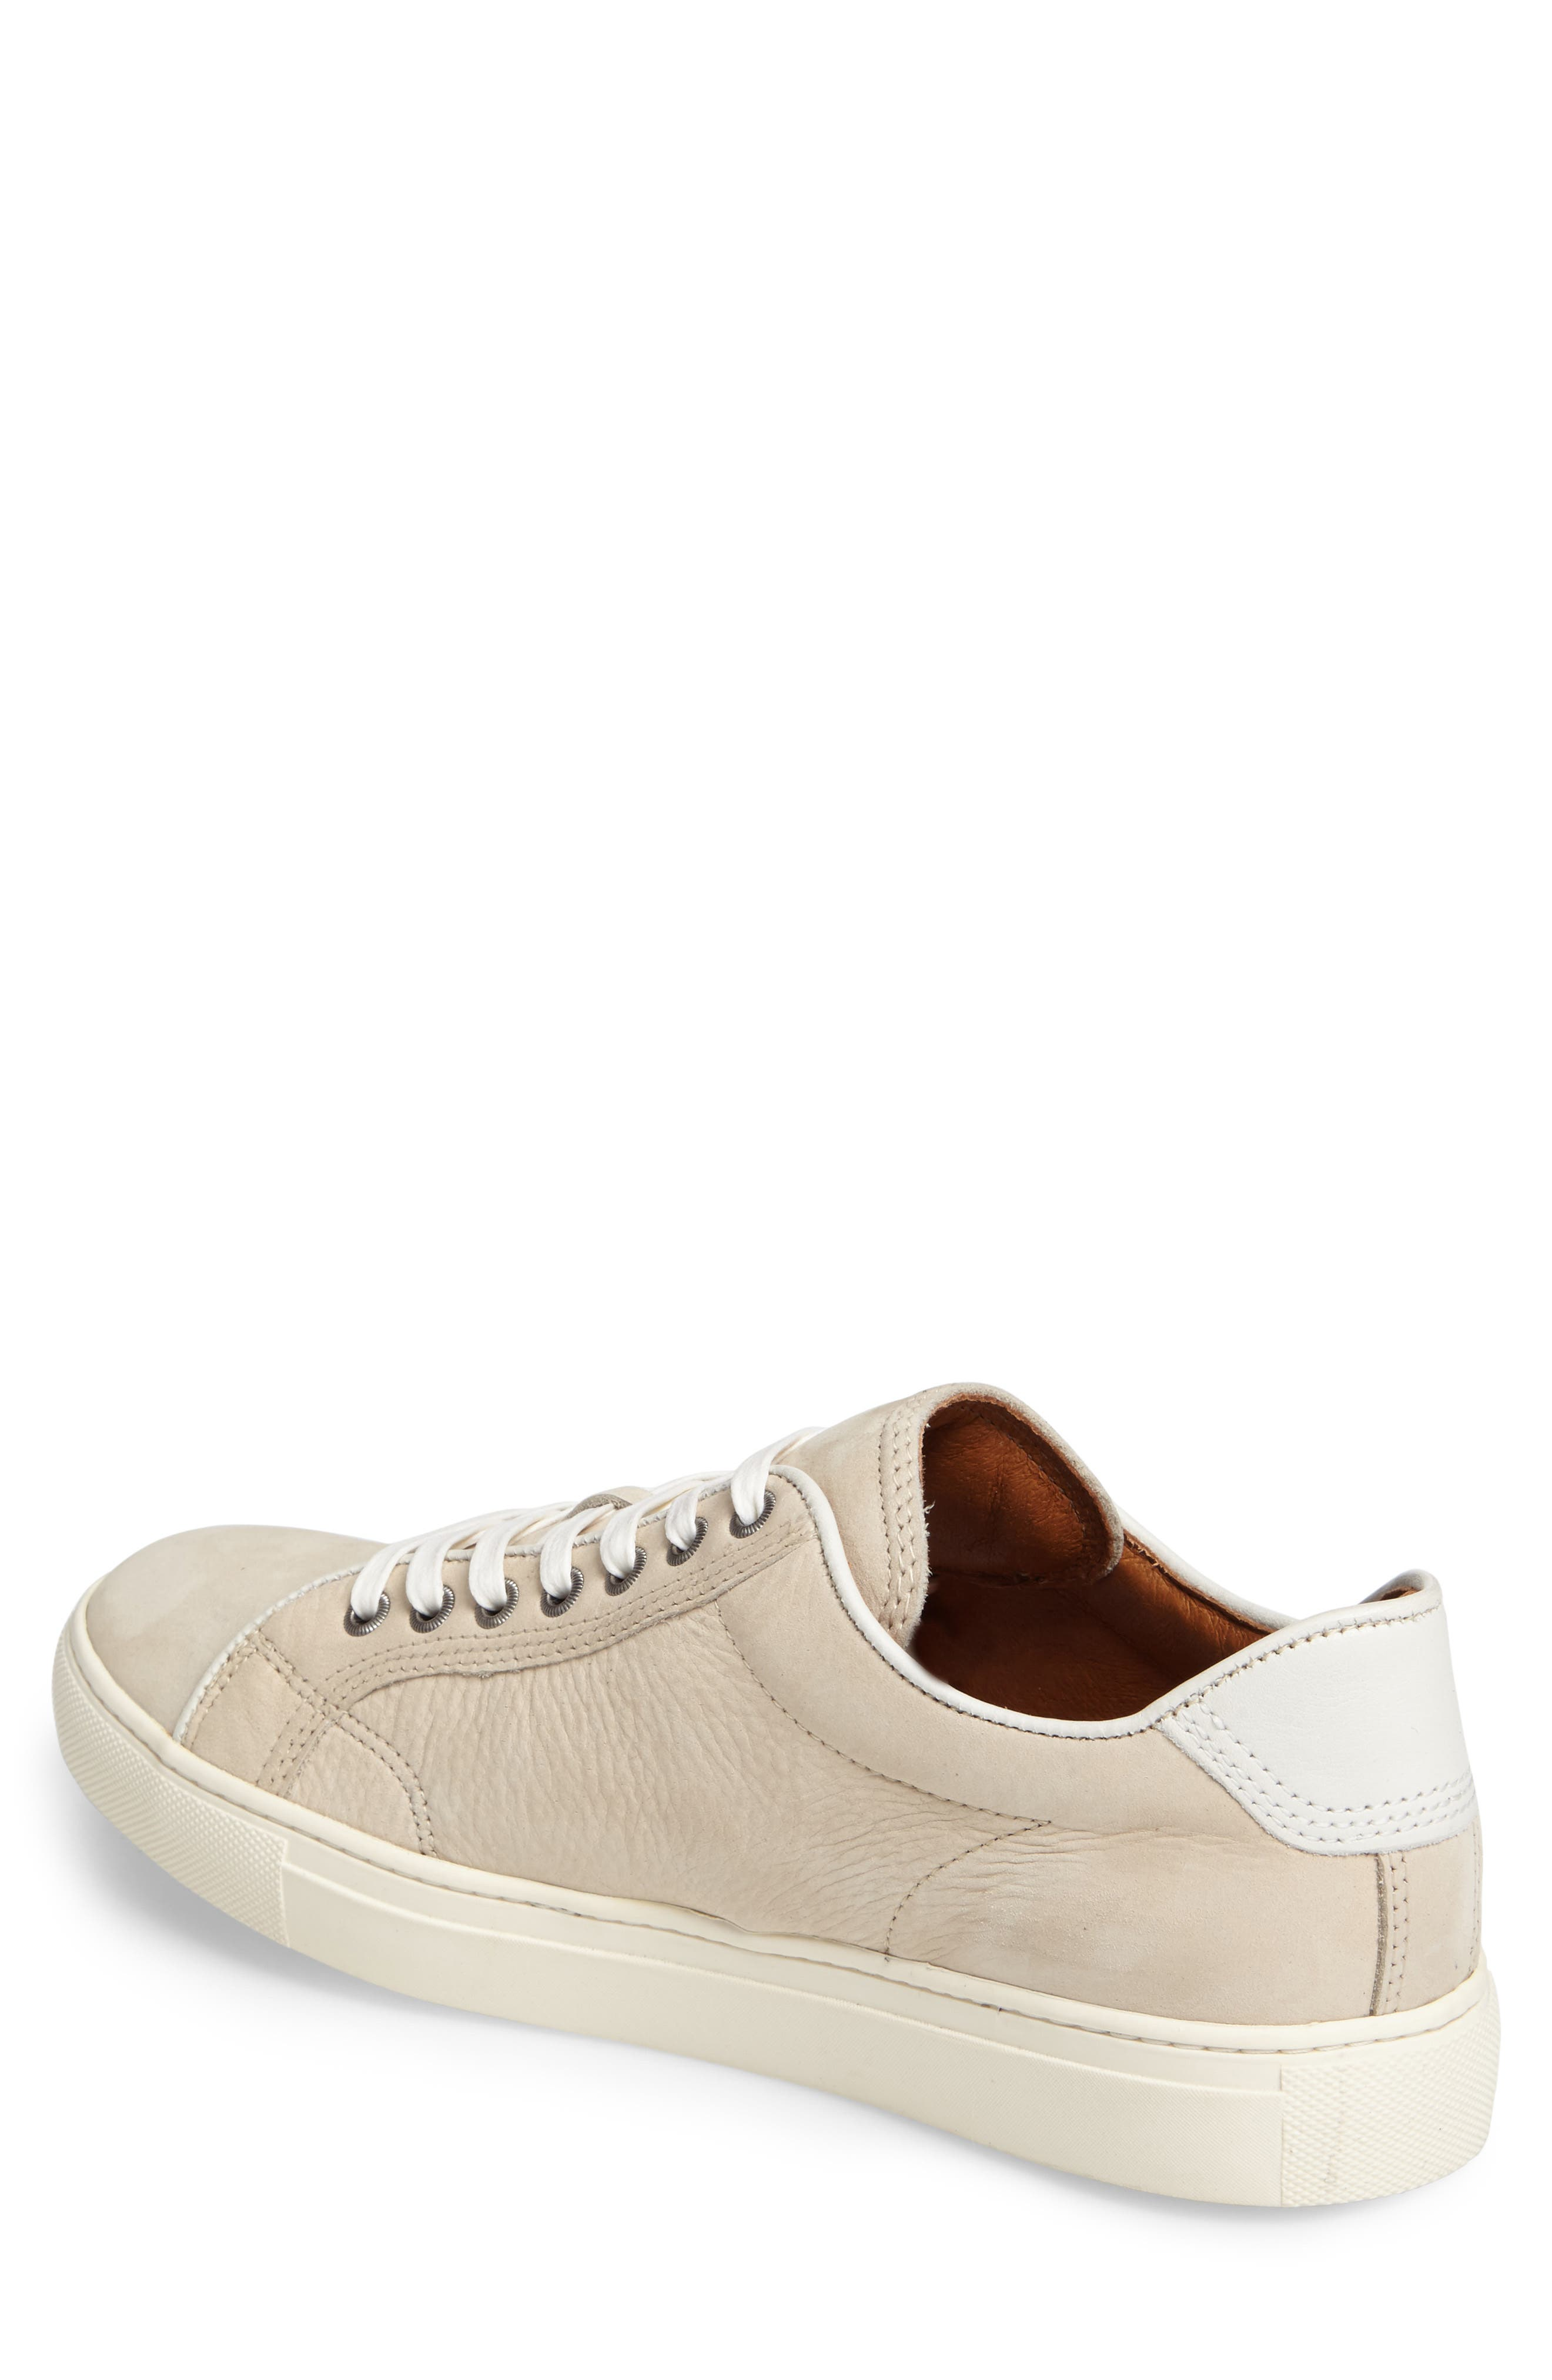 Alternate Image 2  - Frye Walker Low Top Sneaker (Men)